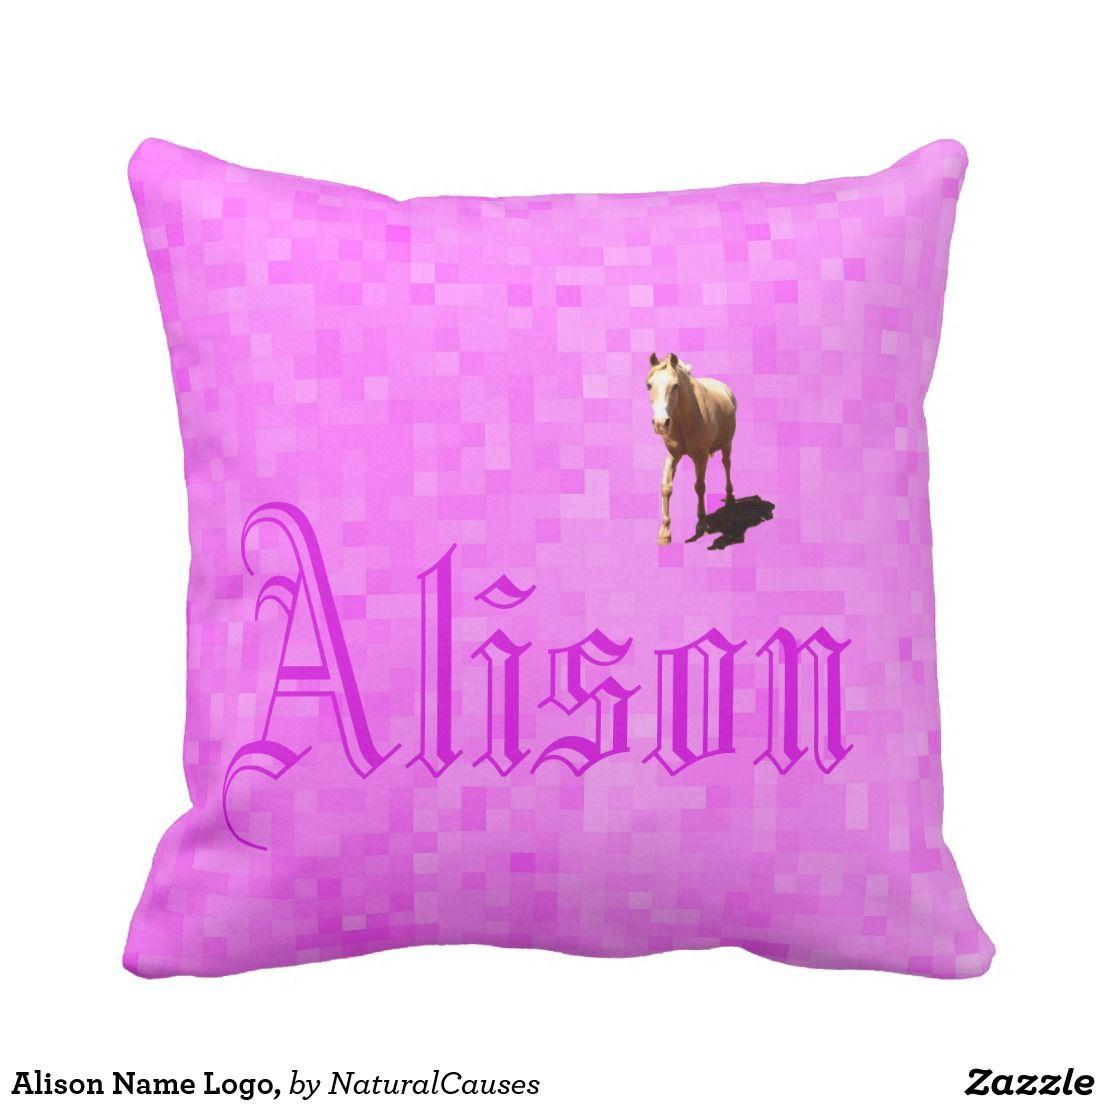 Alison Name Logo, Cushion   Zazzle.com.au